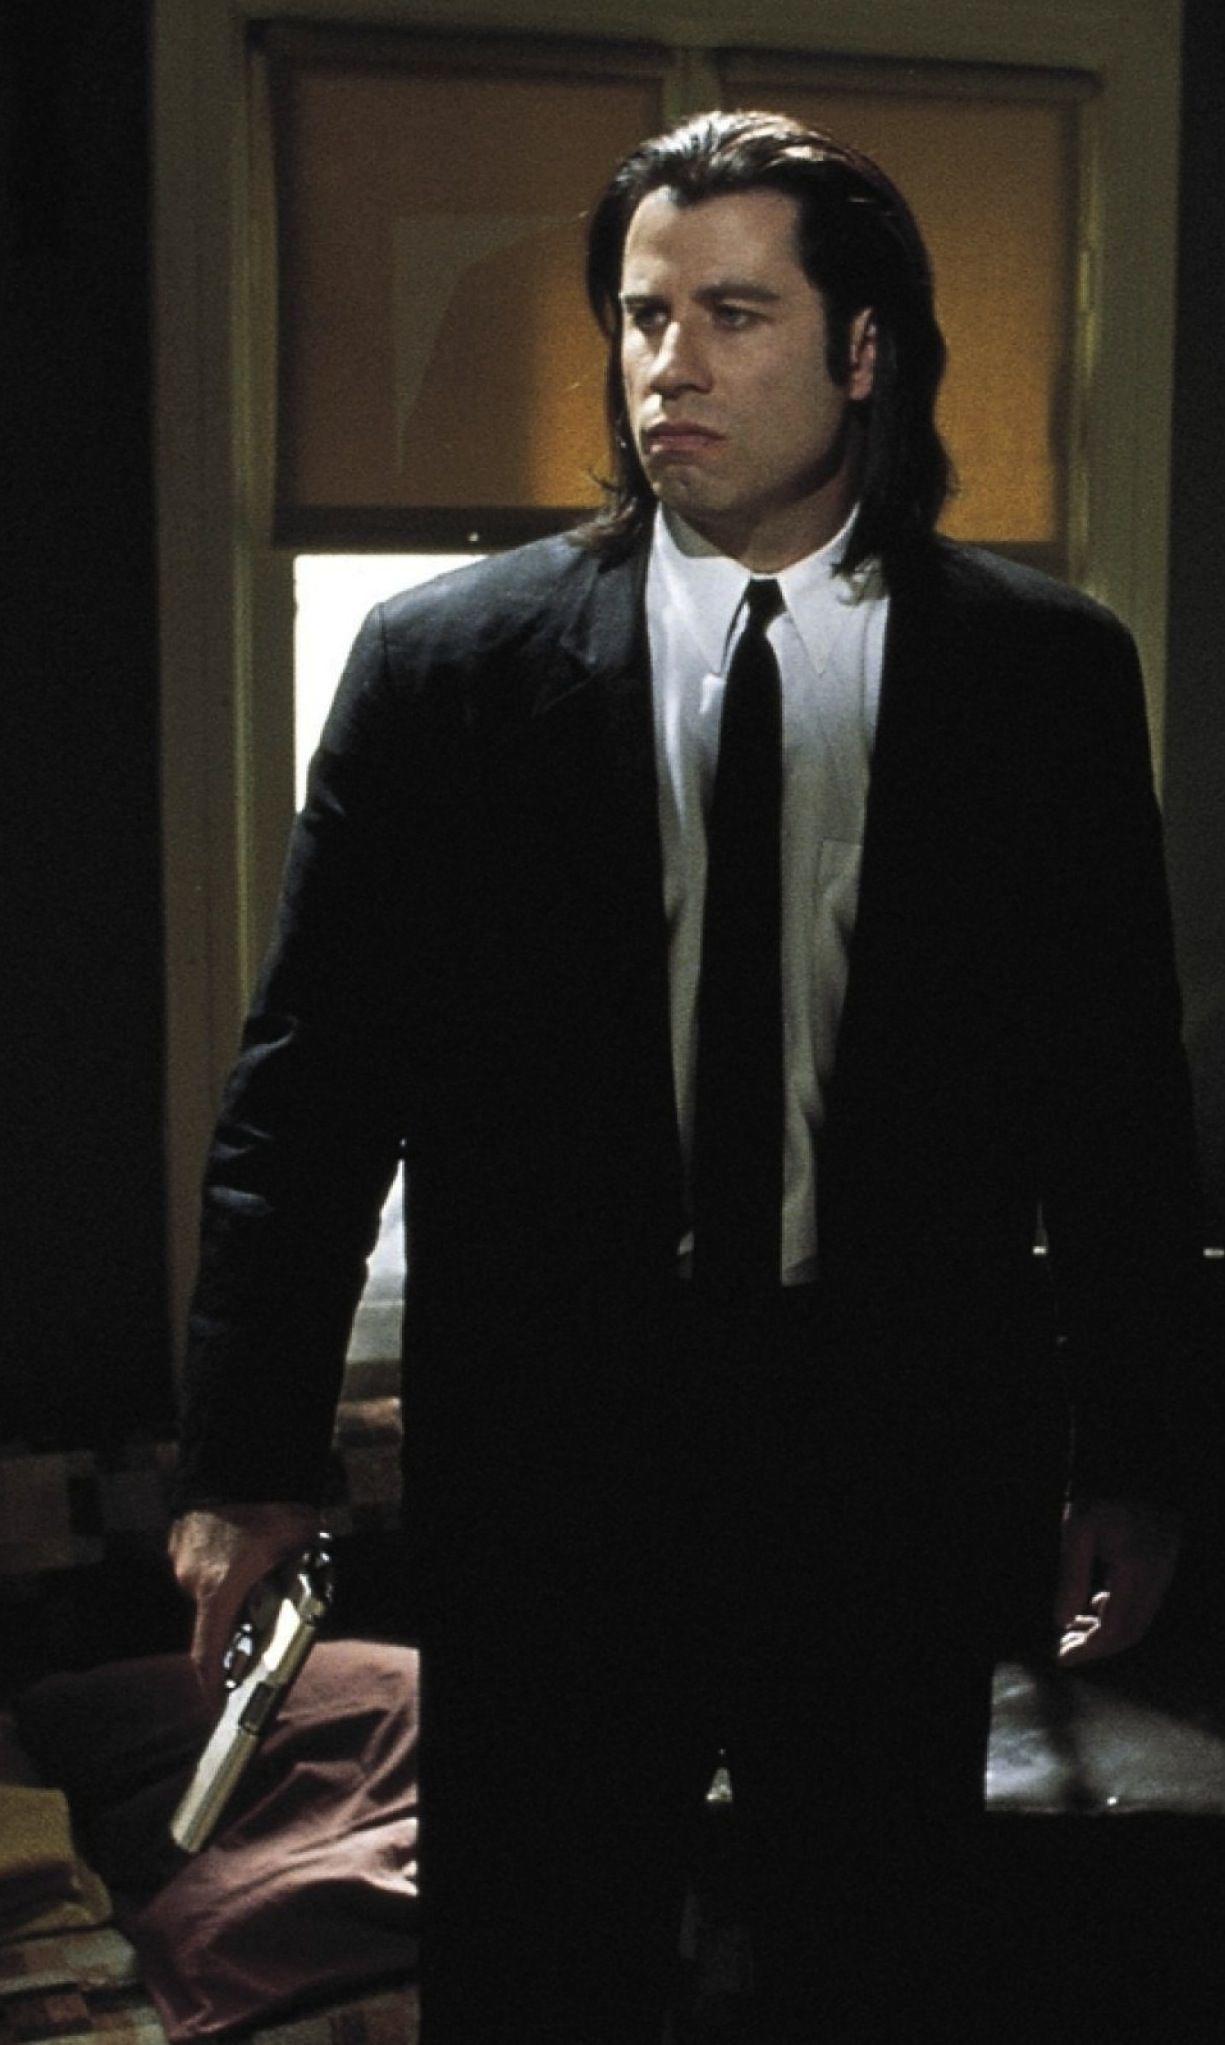 John Travolta, Pulp Fiction